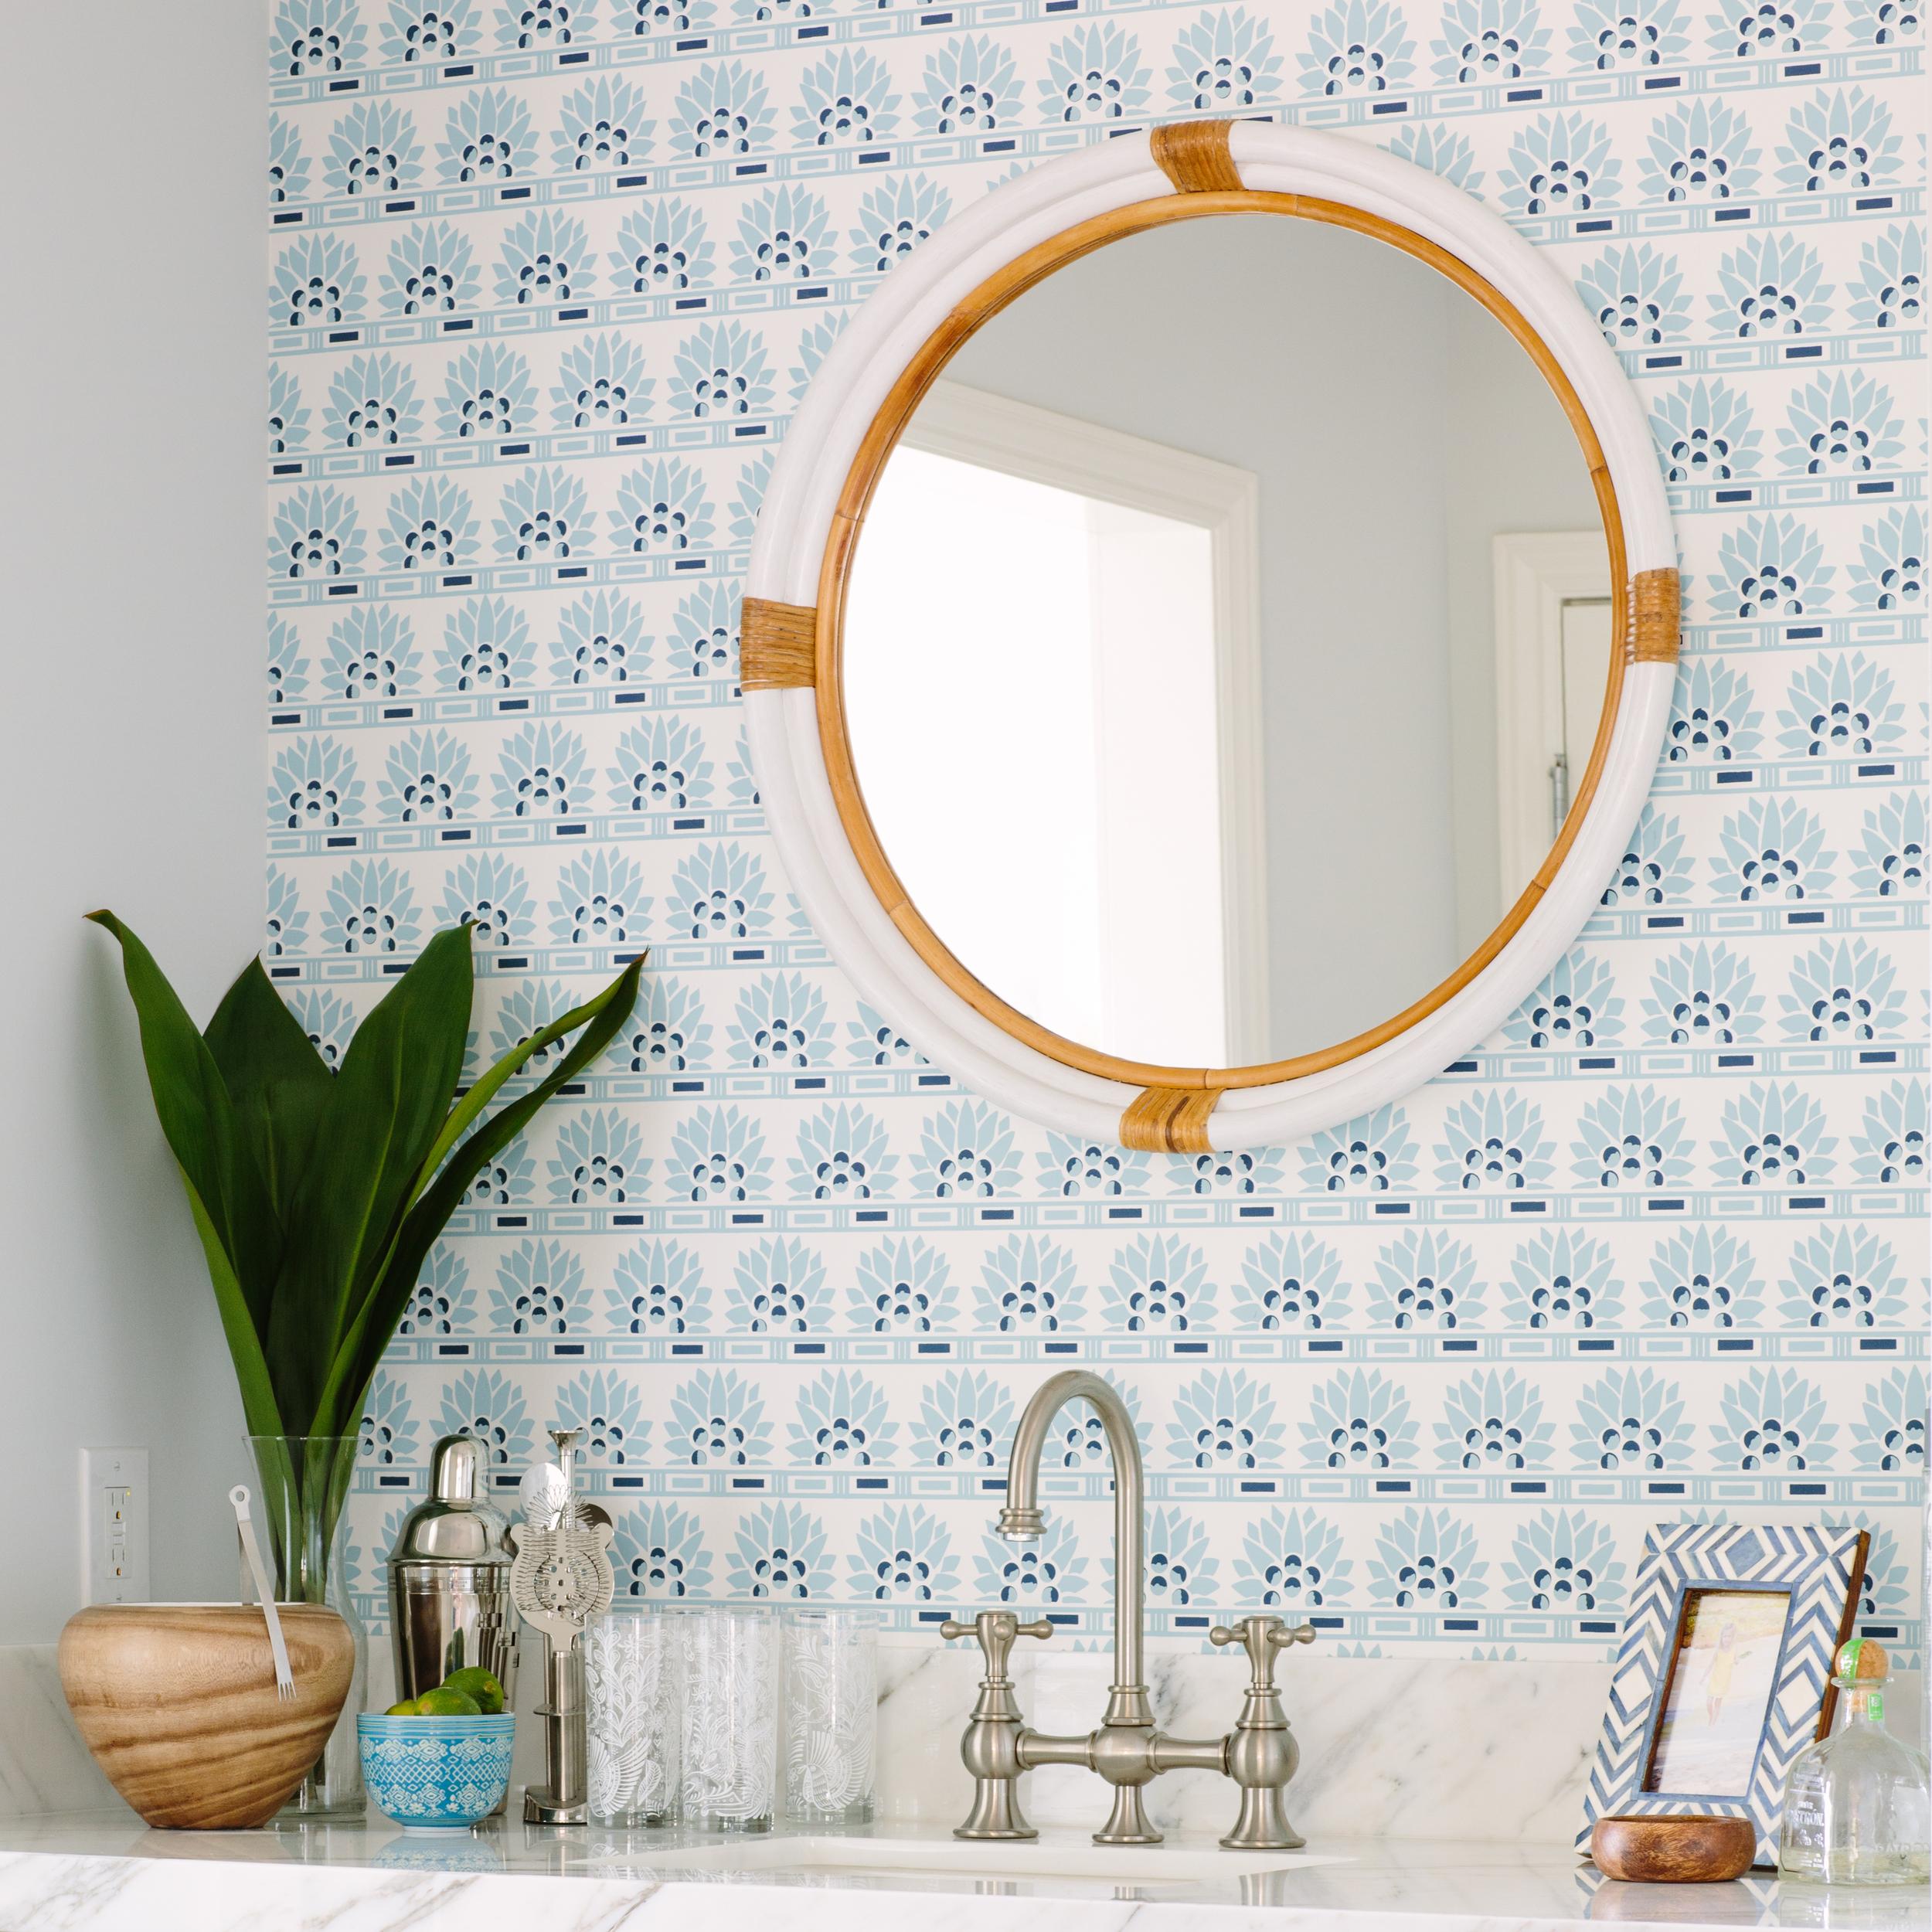 Meg Braff - Wallpaper - Little Egypt Bathroom Shot.jpeg